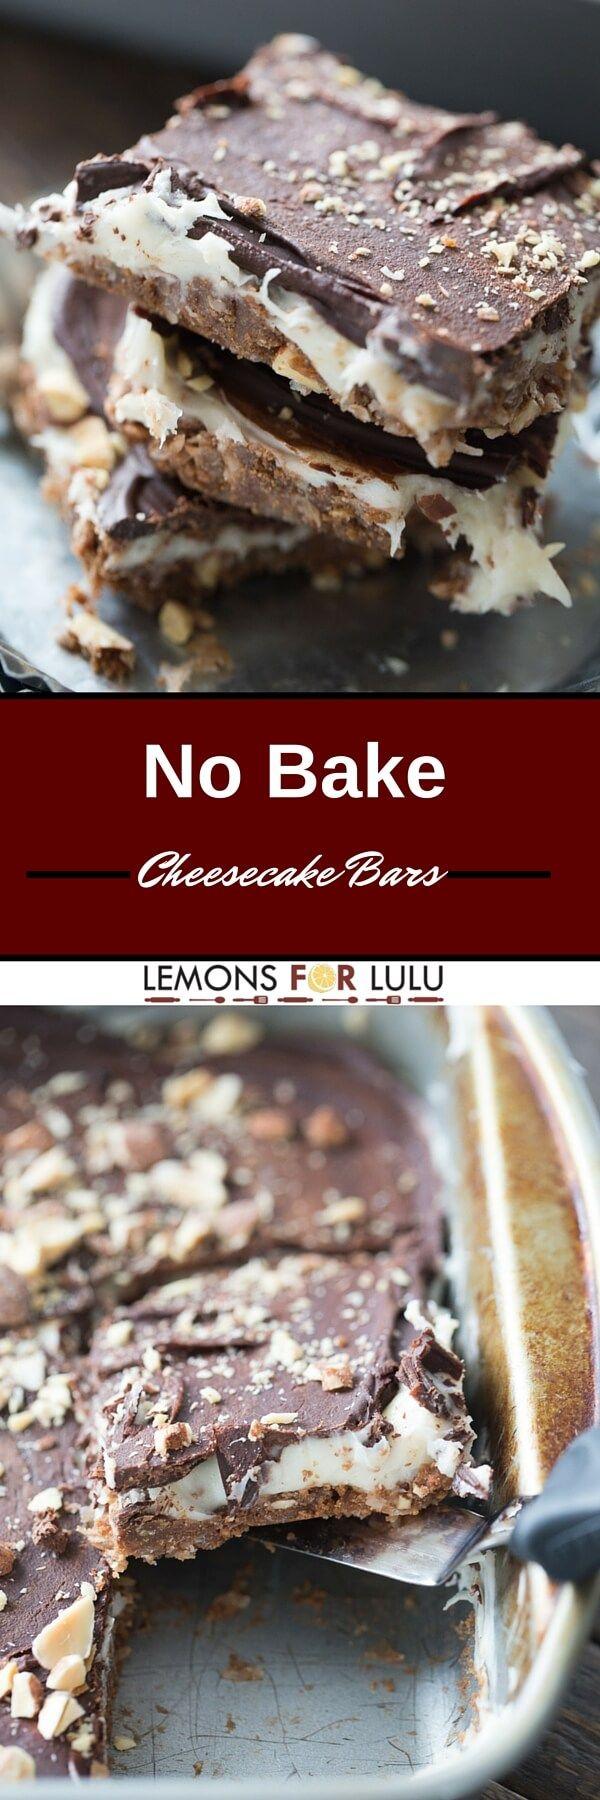 83 Best Desserts No Bake Images On Pinterest Dessert